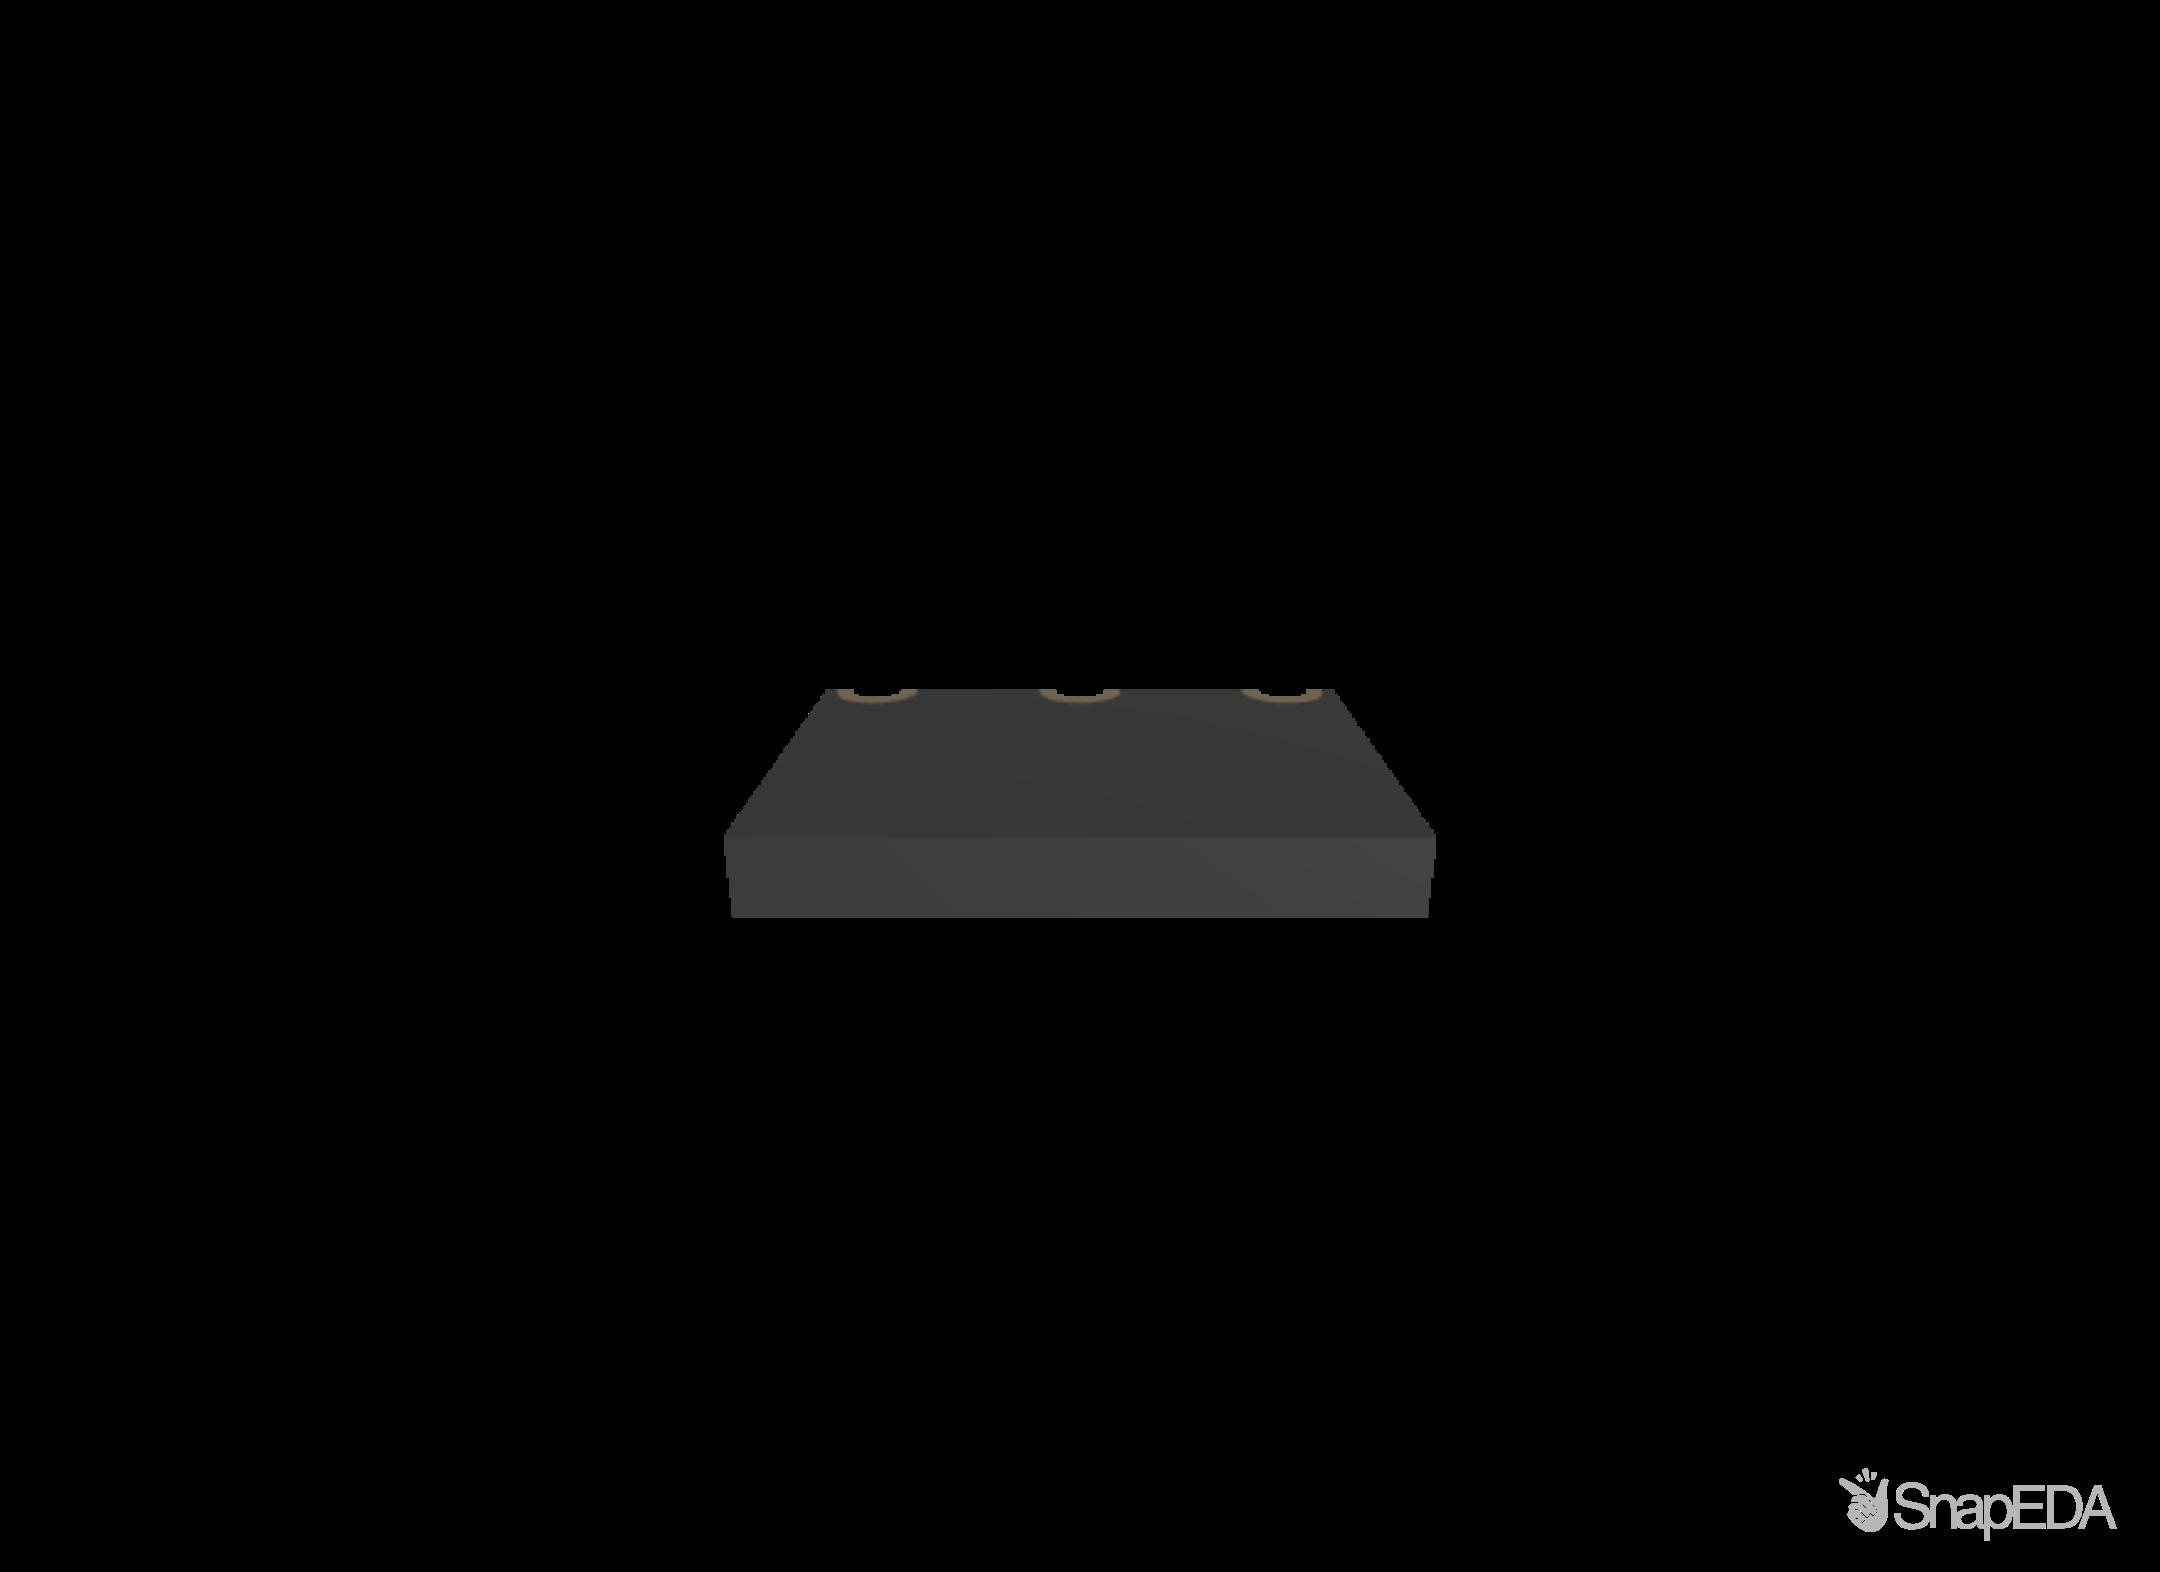 ANT-2.4-USP-T 3D Model